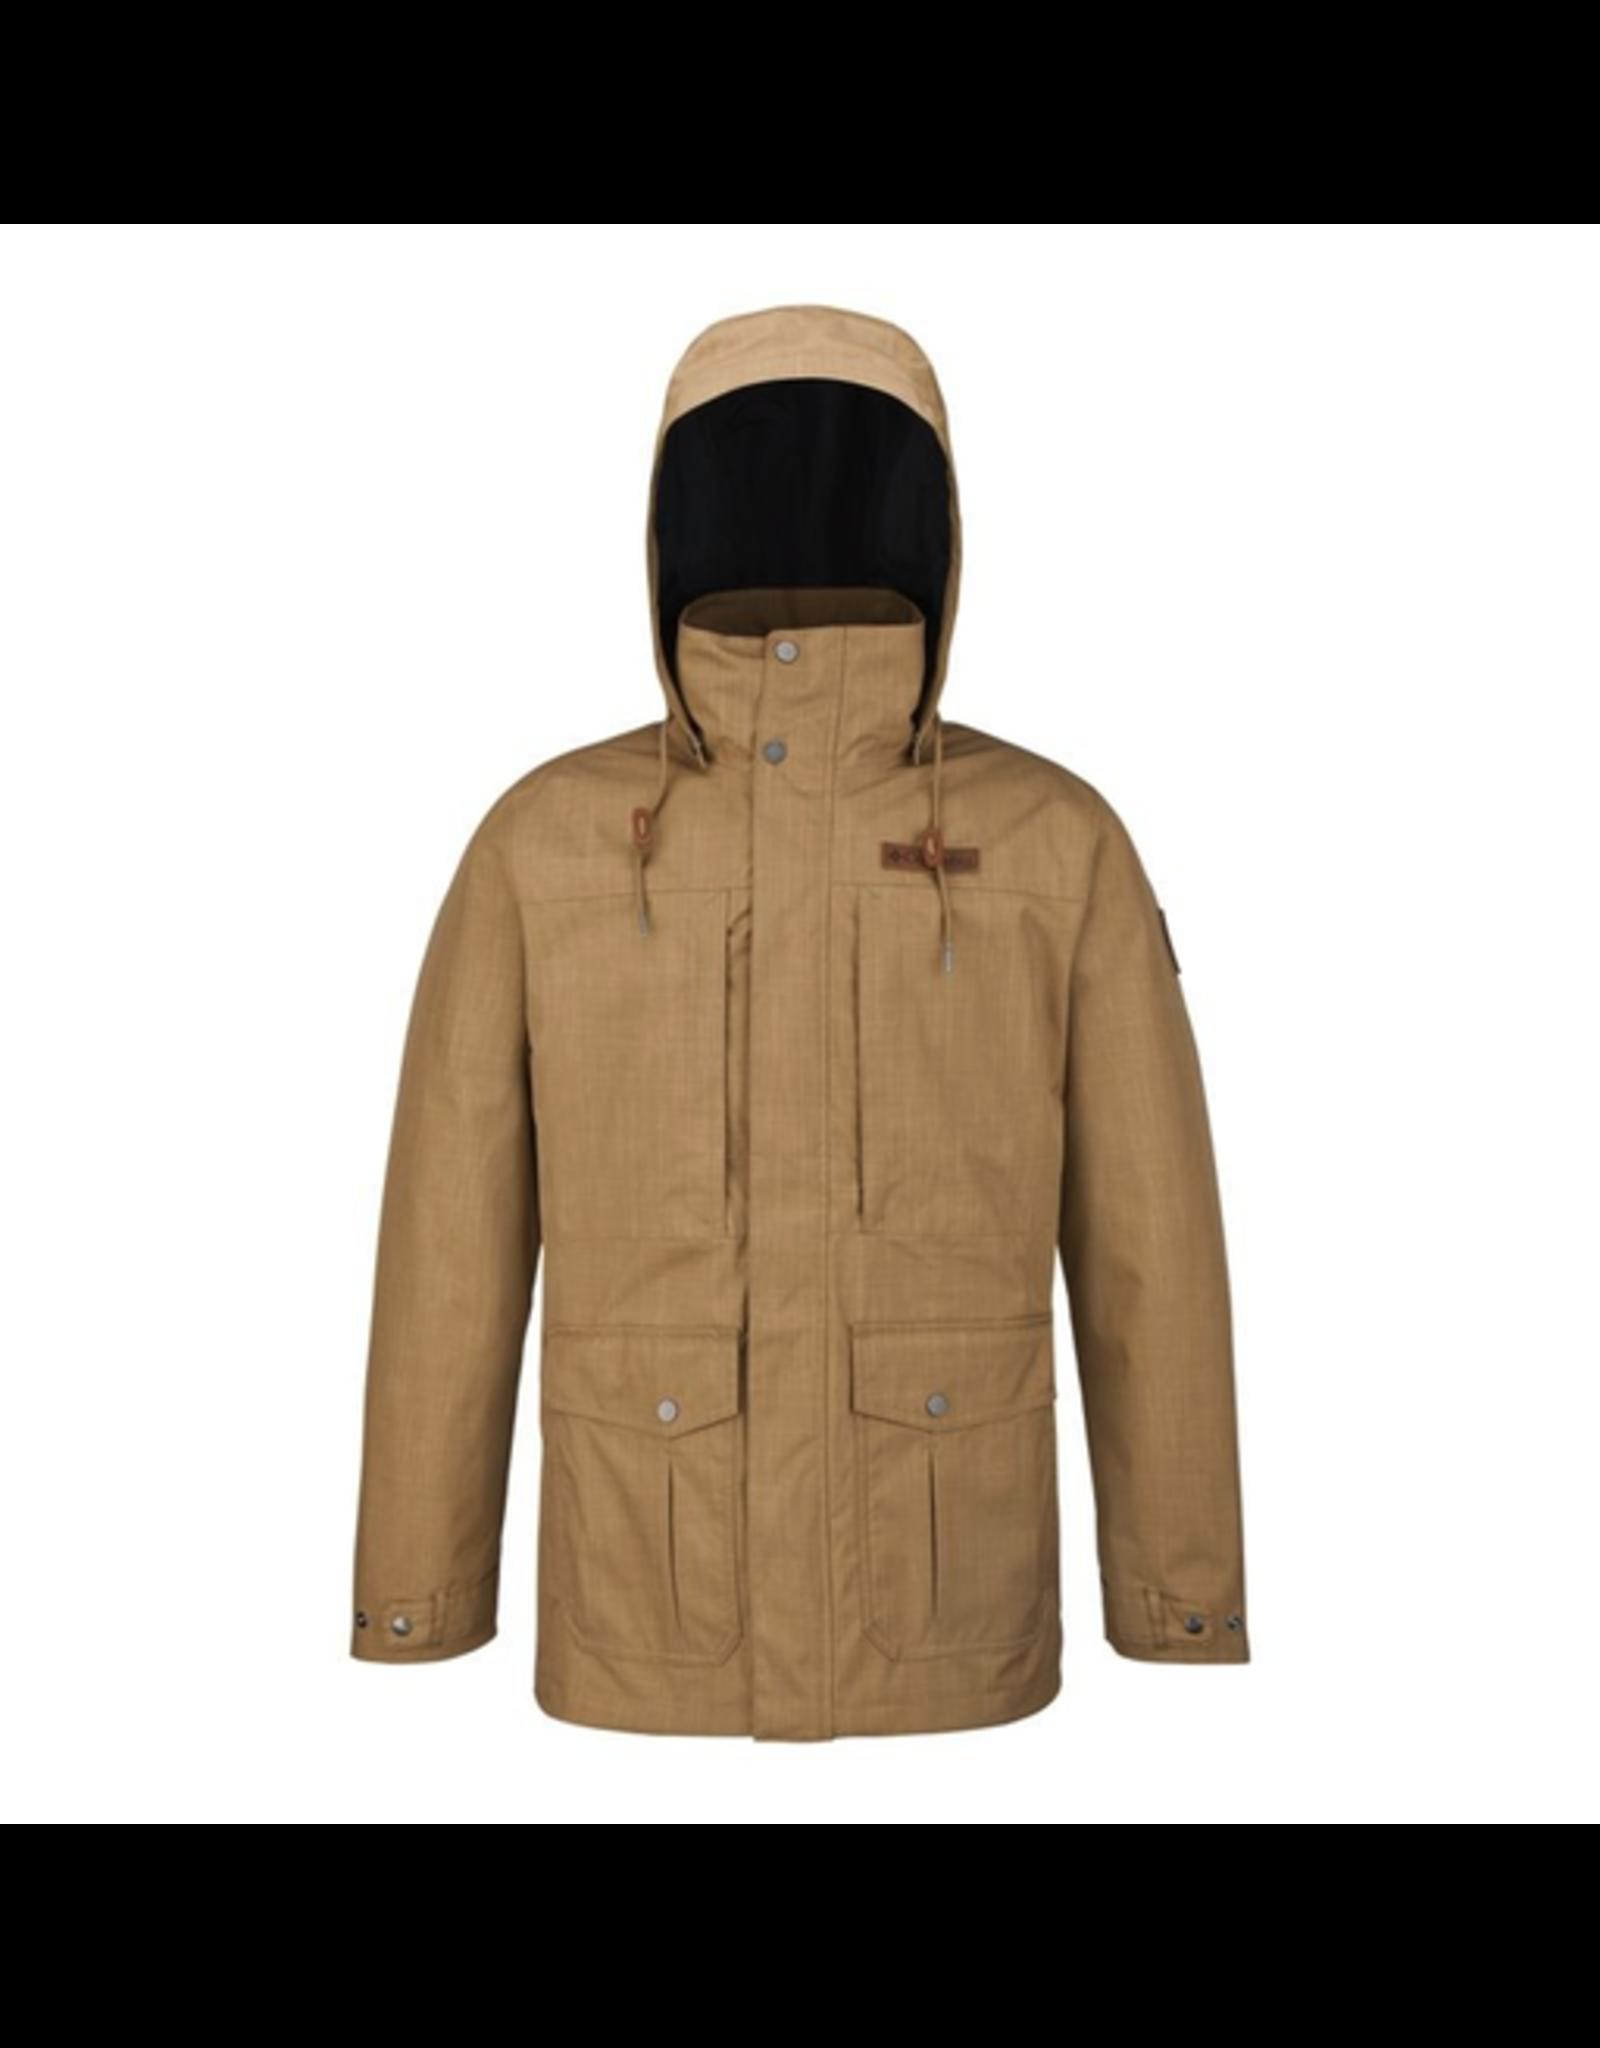 Columbia Columbia Men's Horizons Pine Interchange Jacket